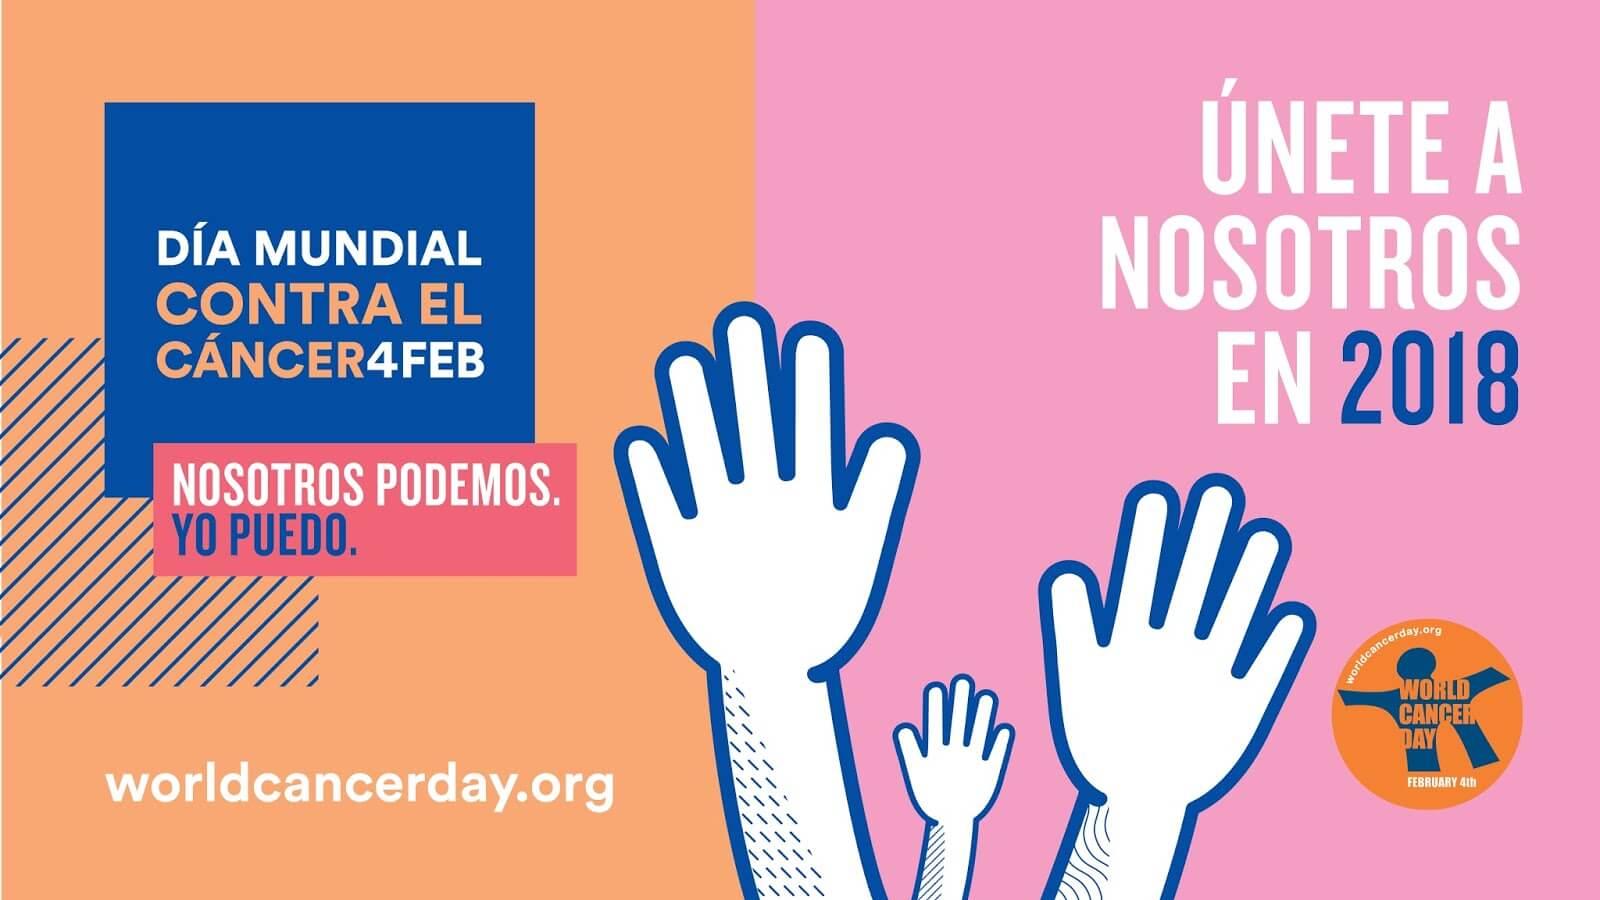 dia mundial contra el cancer (1)